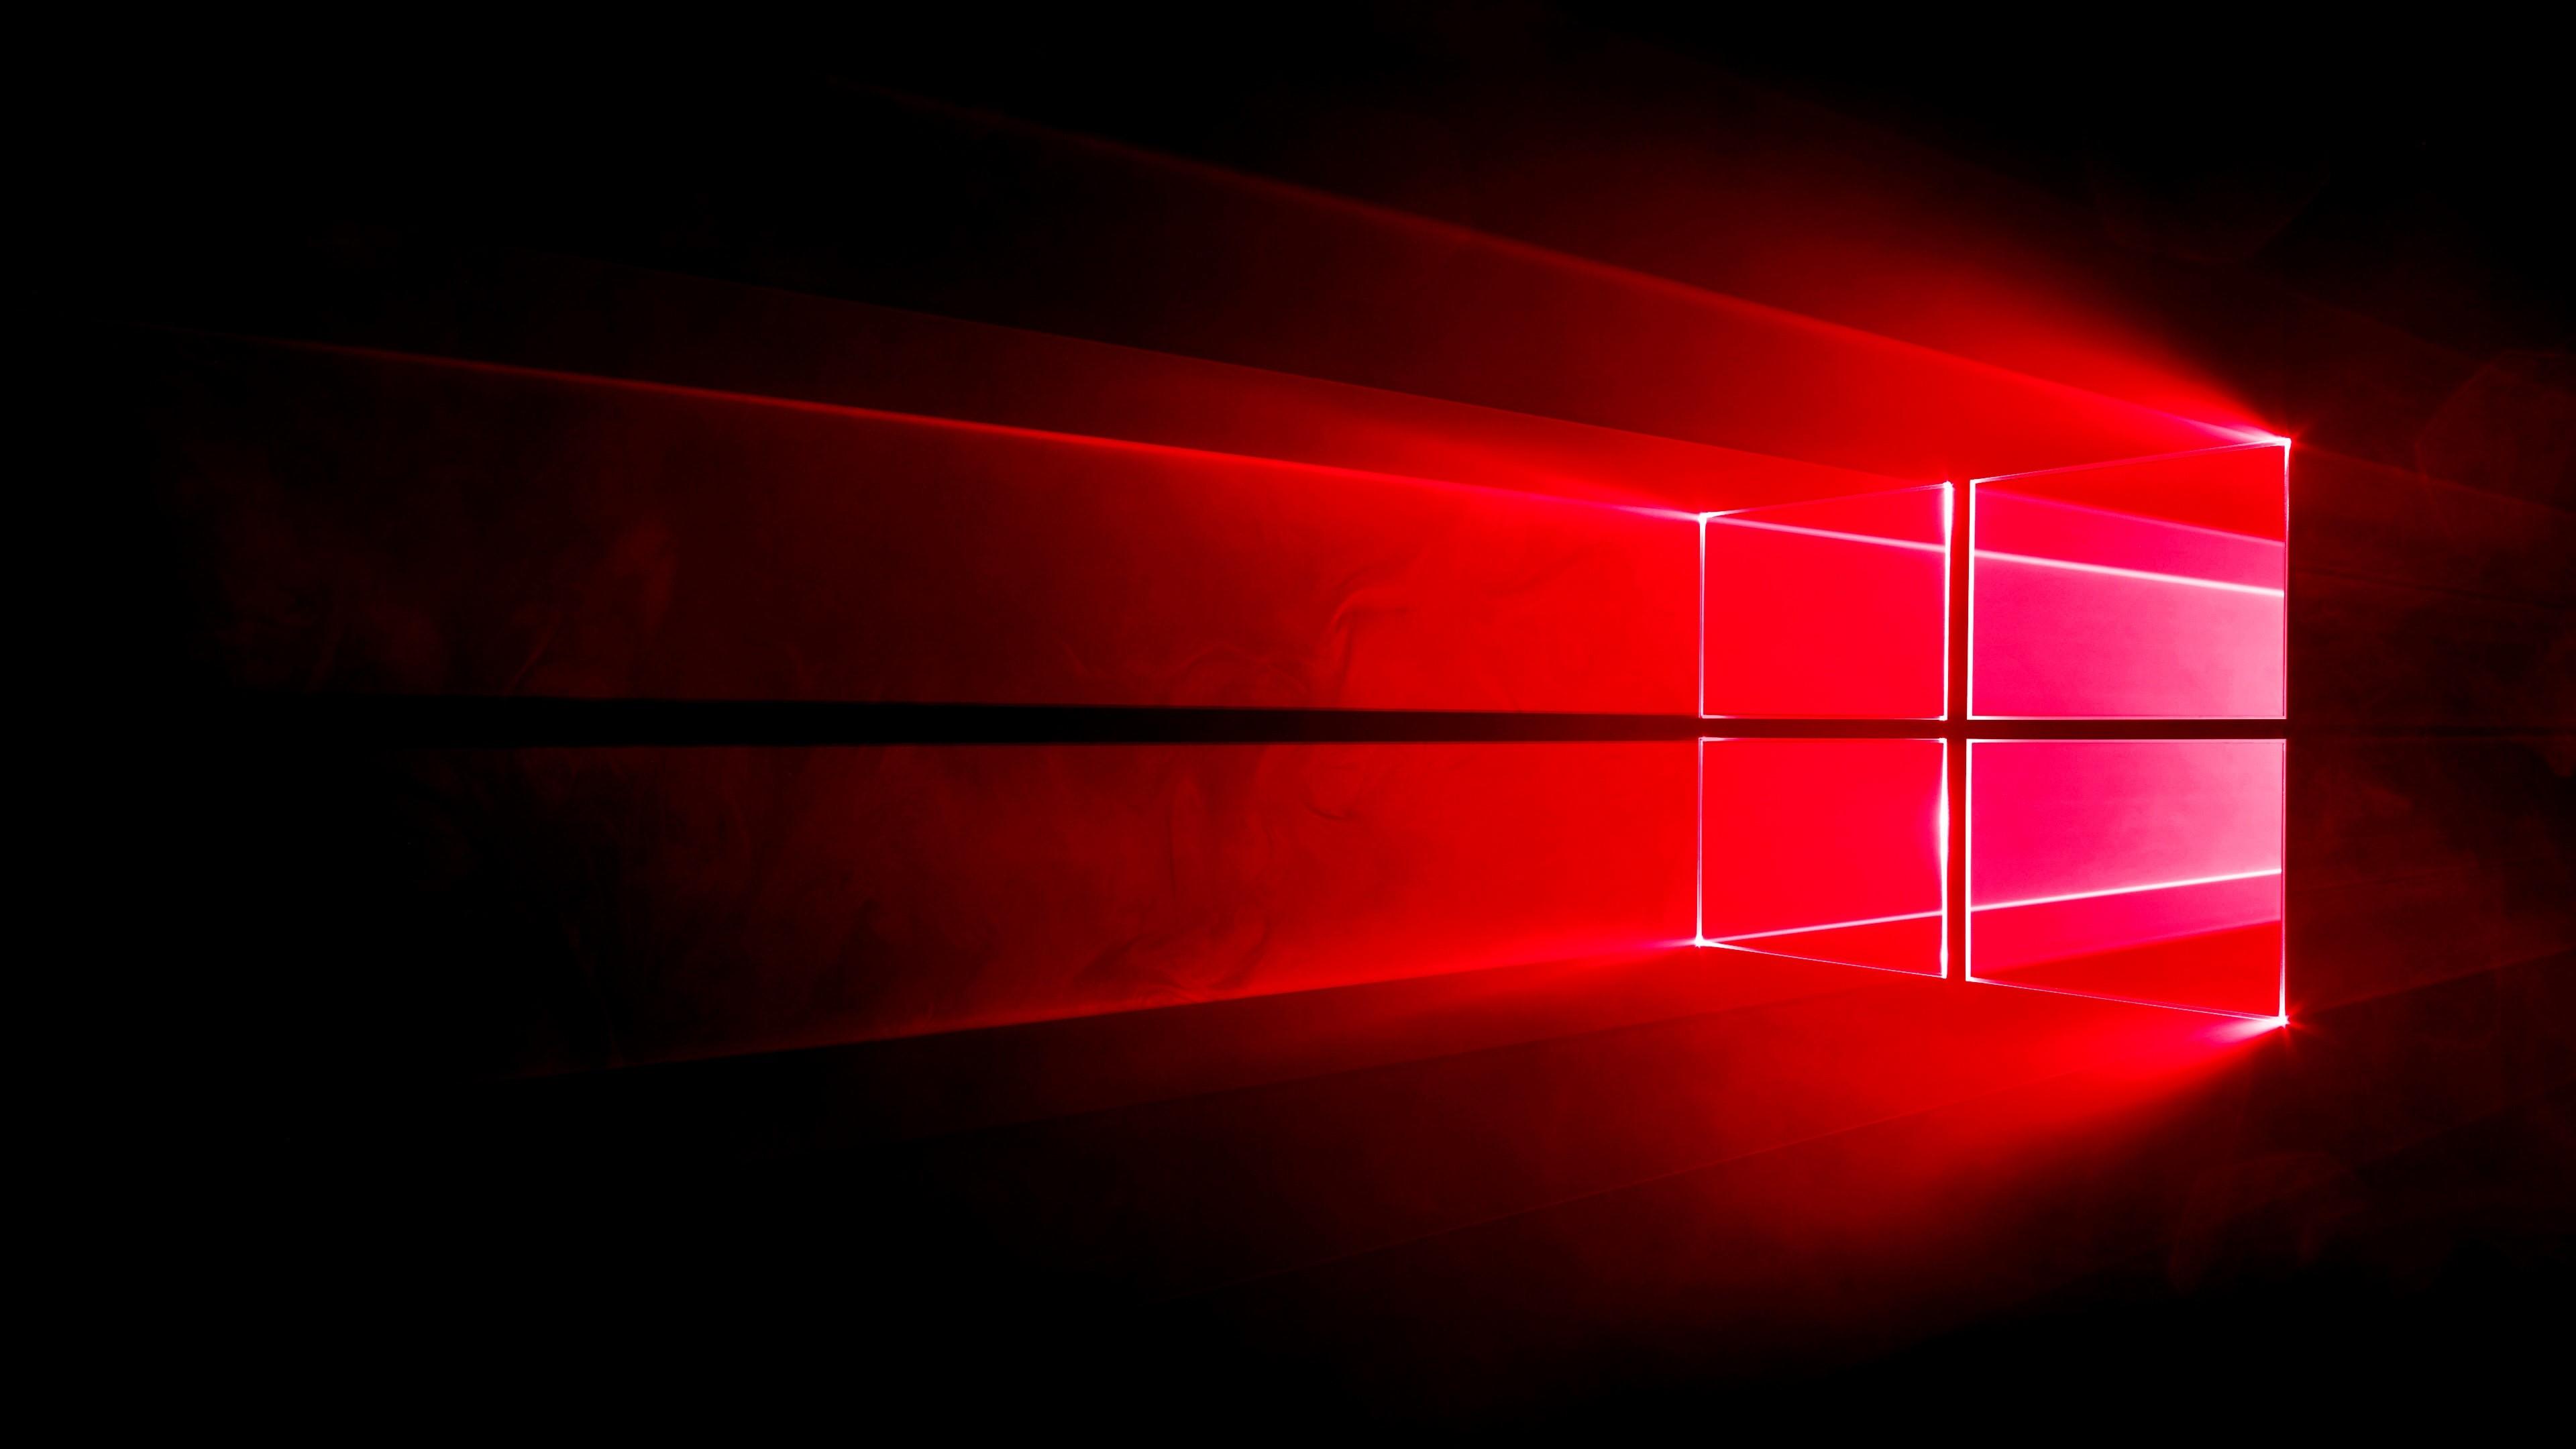 Ninja 3d Wallpaper Microsoft Starts Focusing On Windows 10 Redstone 4 Development